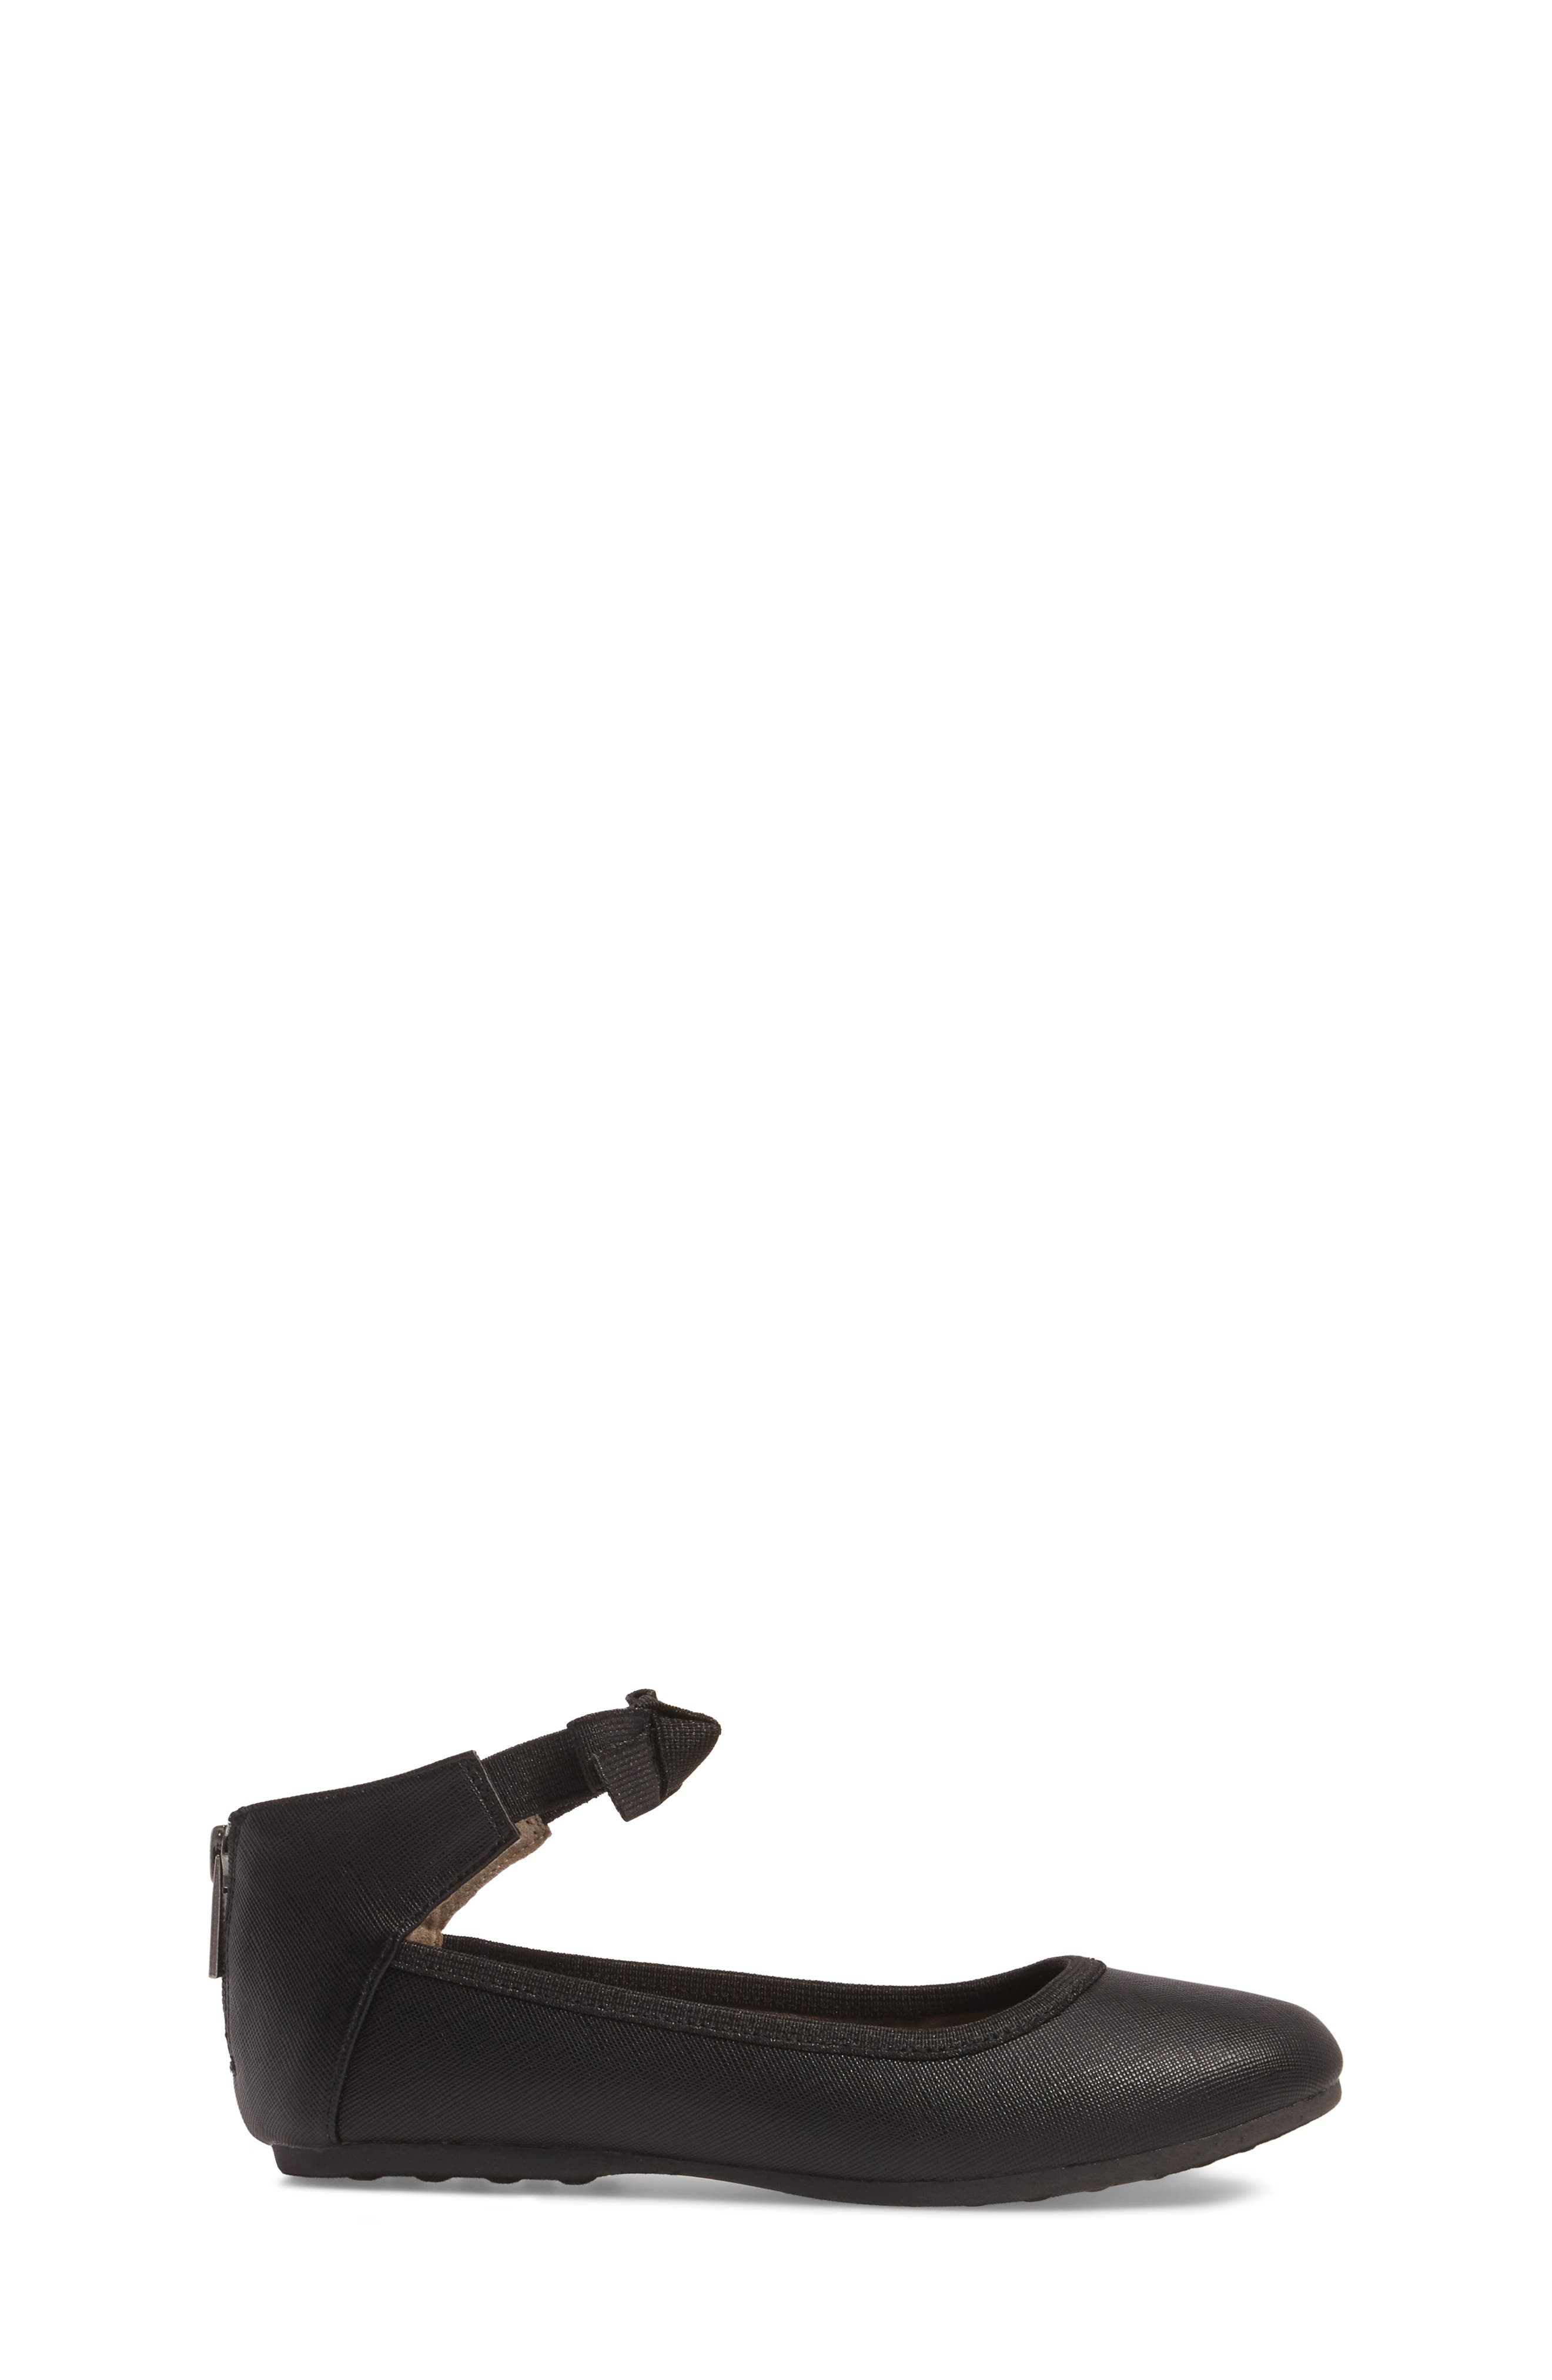 Rose Bow Ballet Flat,                             Alternate thumbnail 3, color,                             BLACK